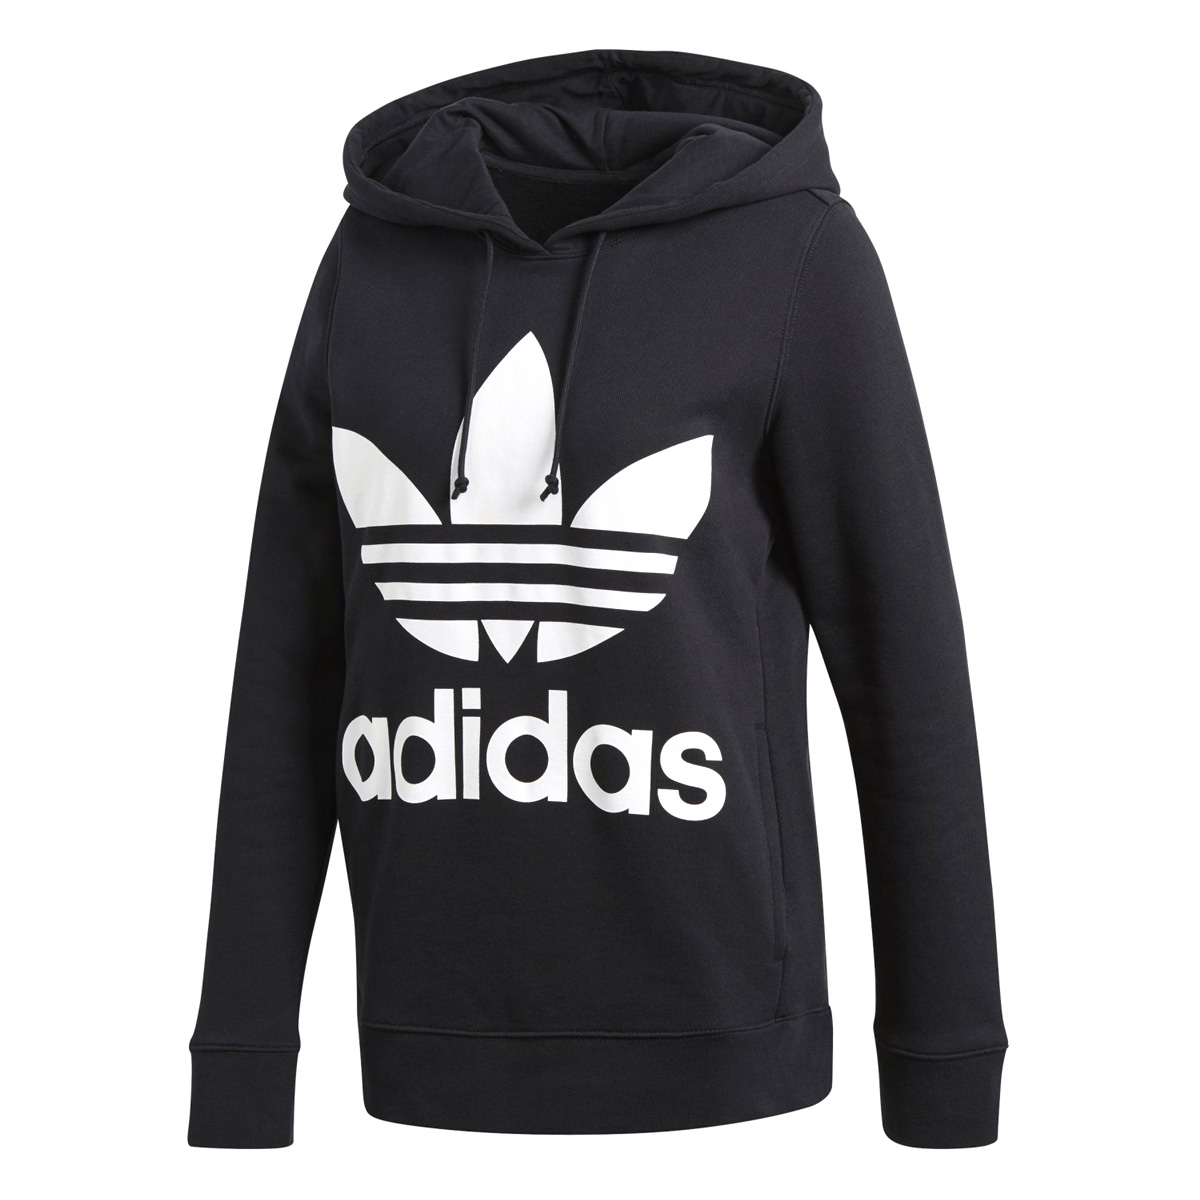 adidas TREFOIL HOODIE アディダス トレフォイル フーディー BLACK